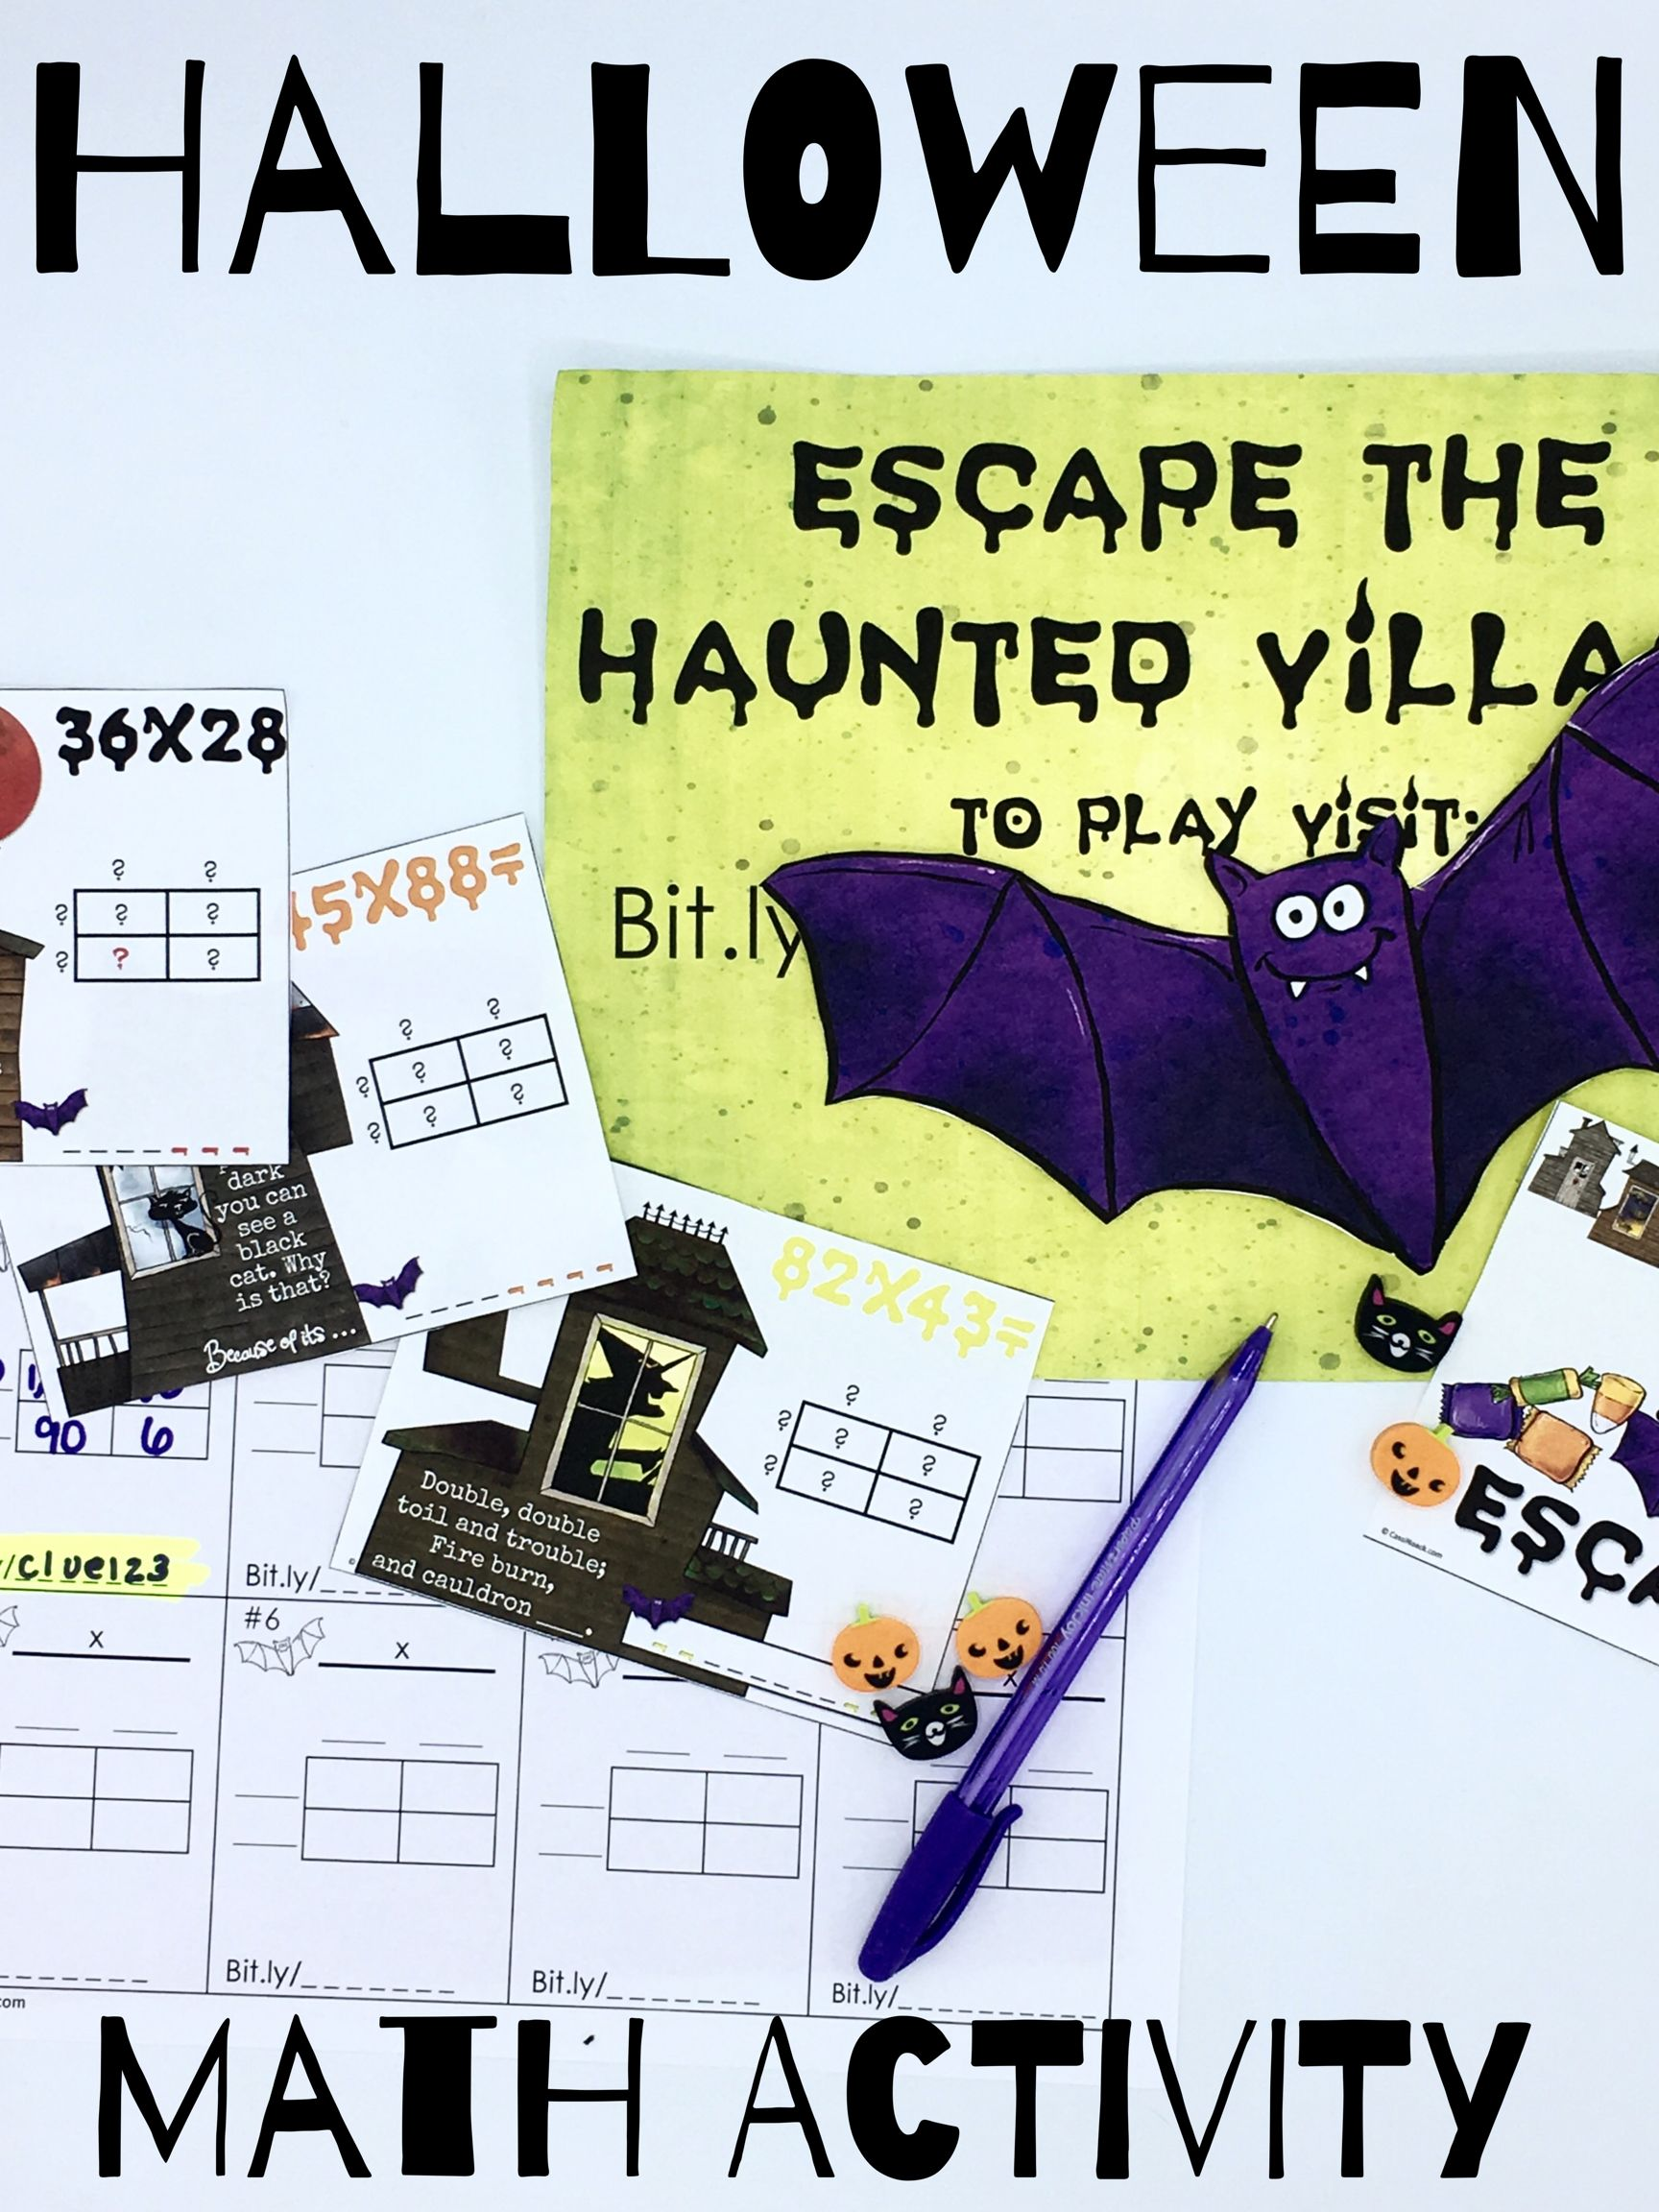 Halloween Escape the Haunted Village Multiplication